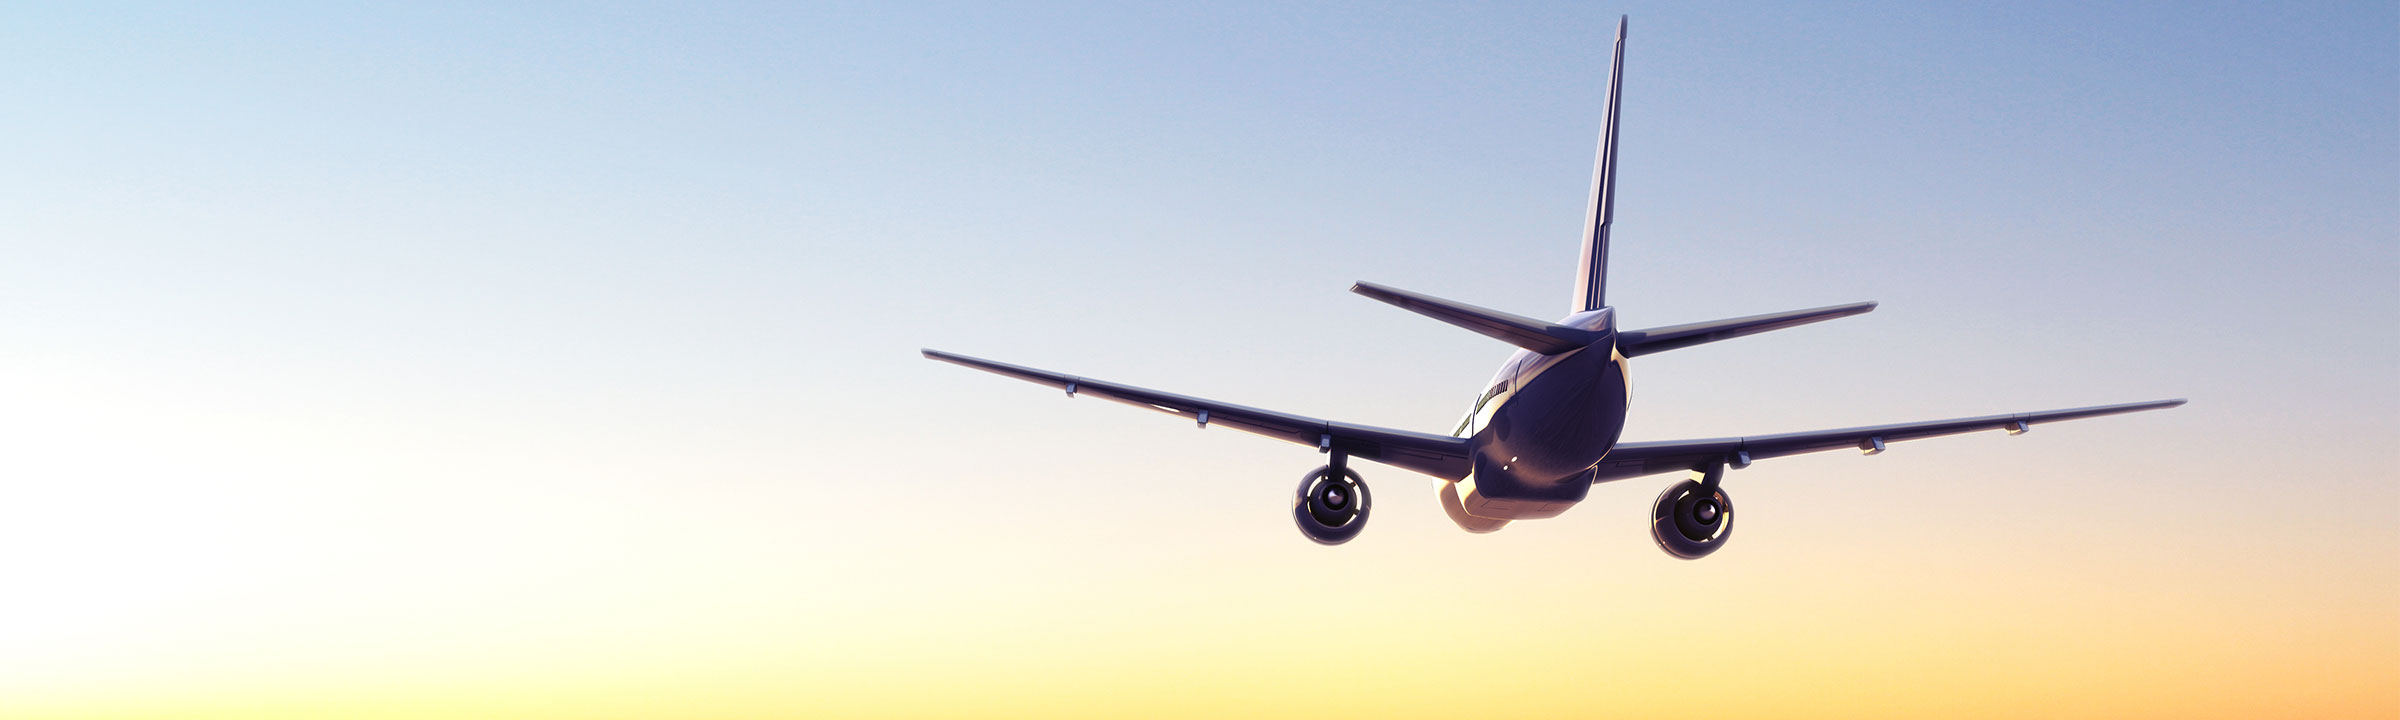 fin-vacances-avion